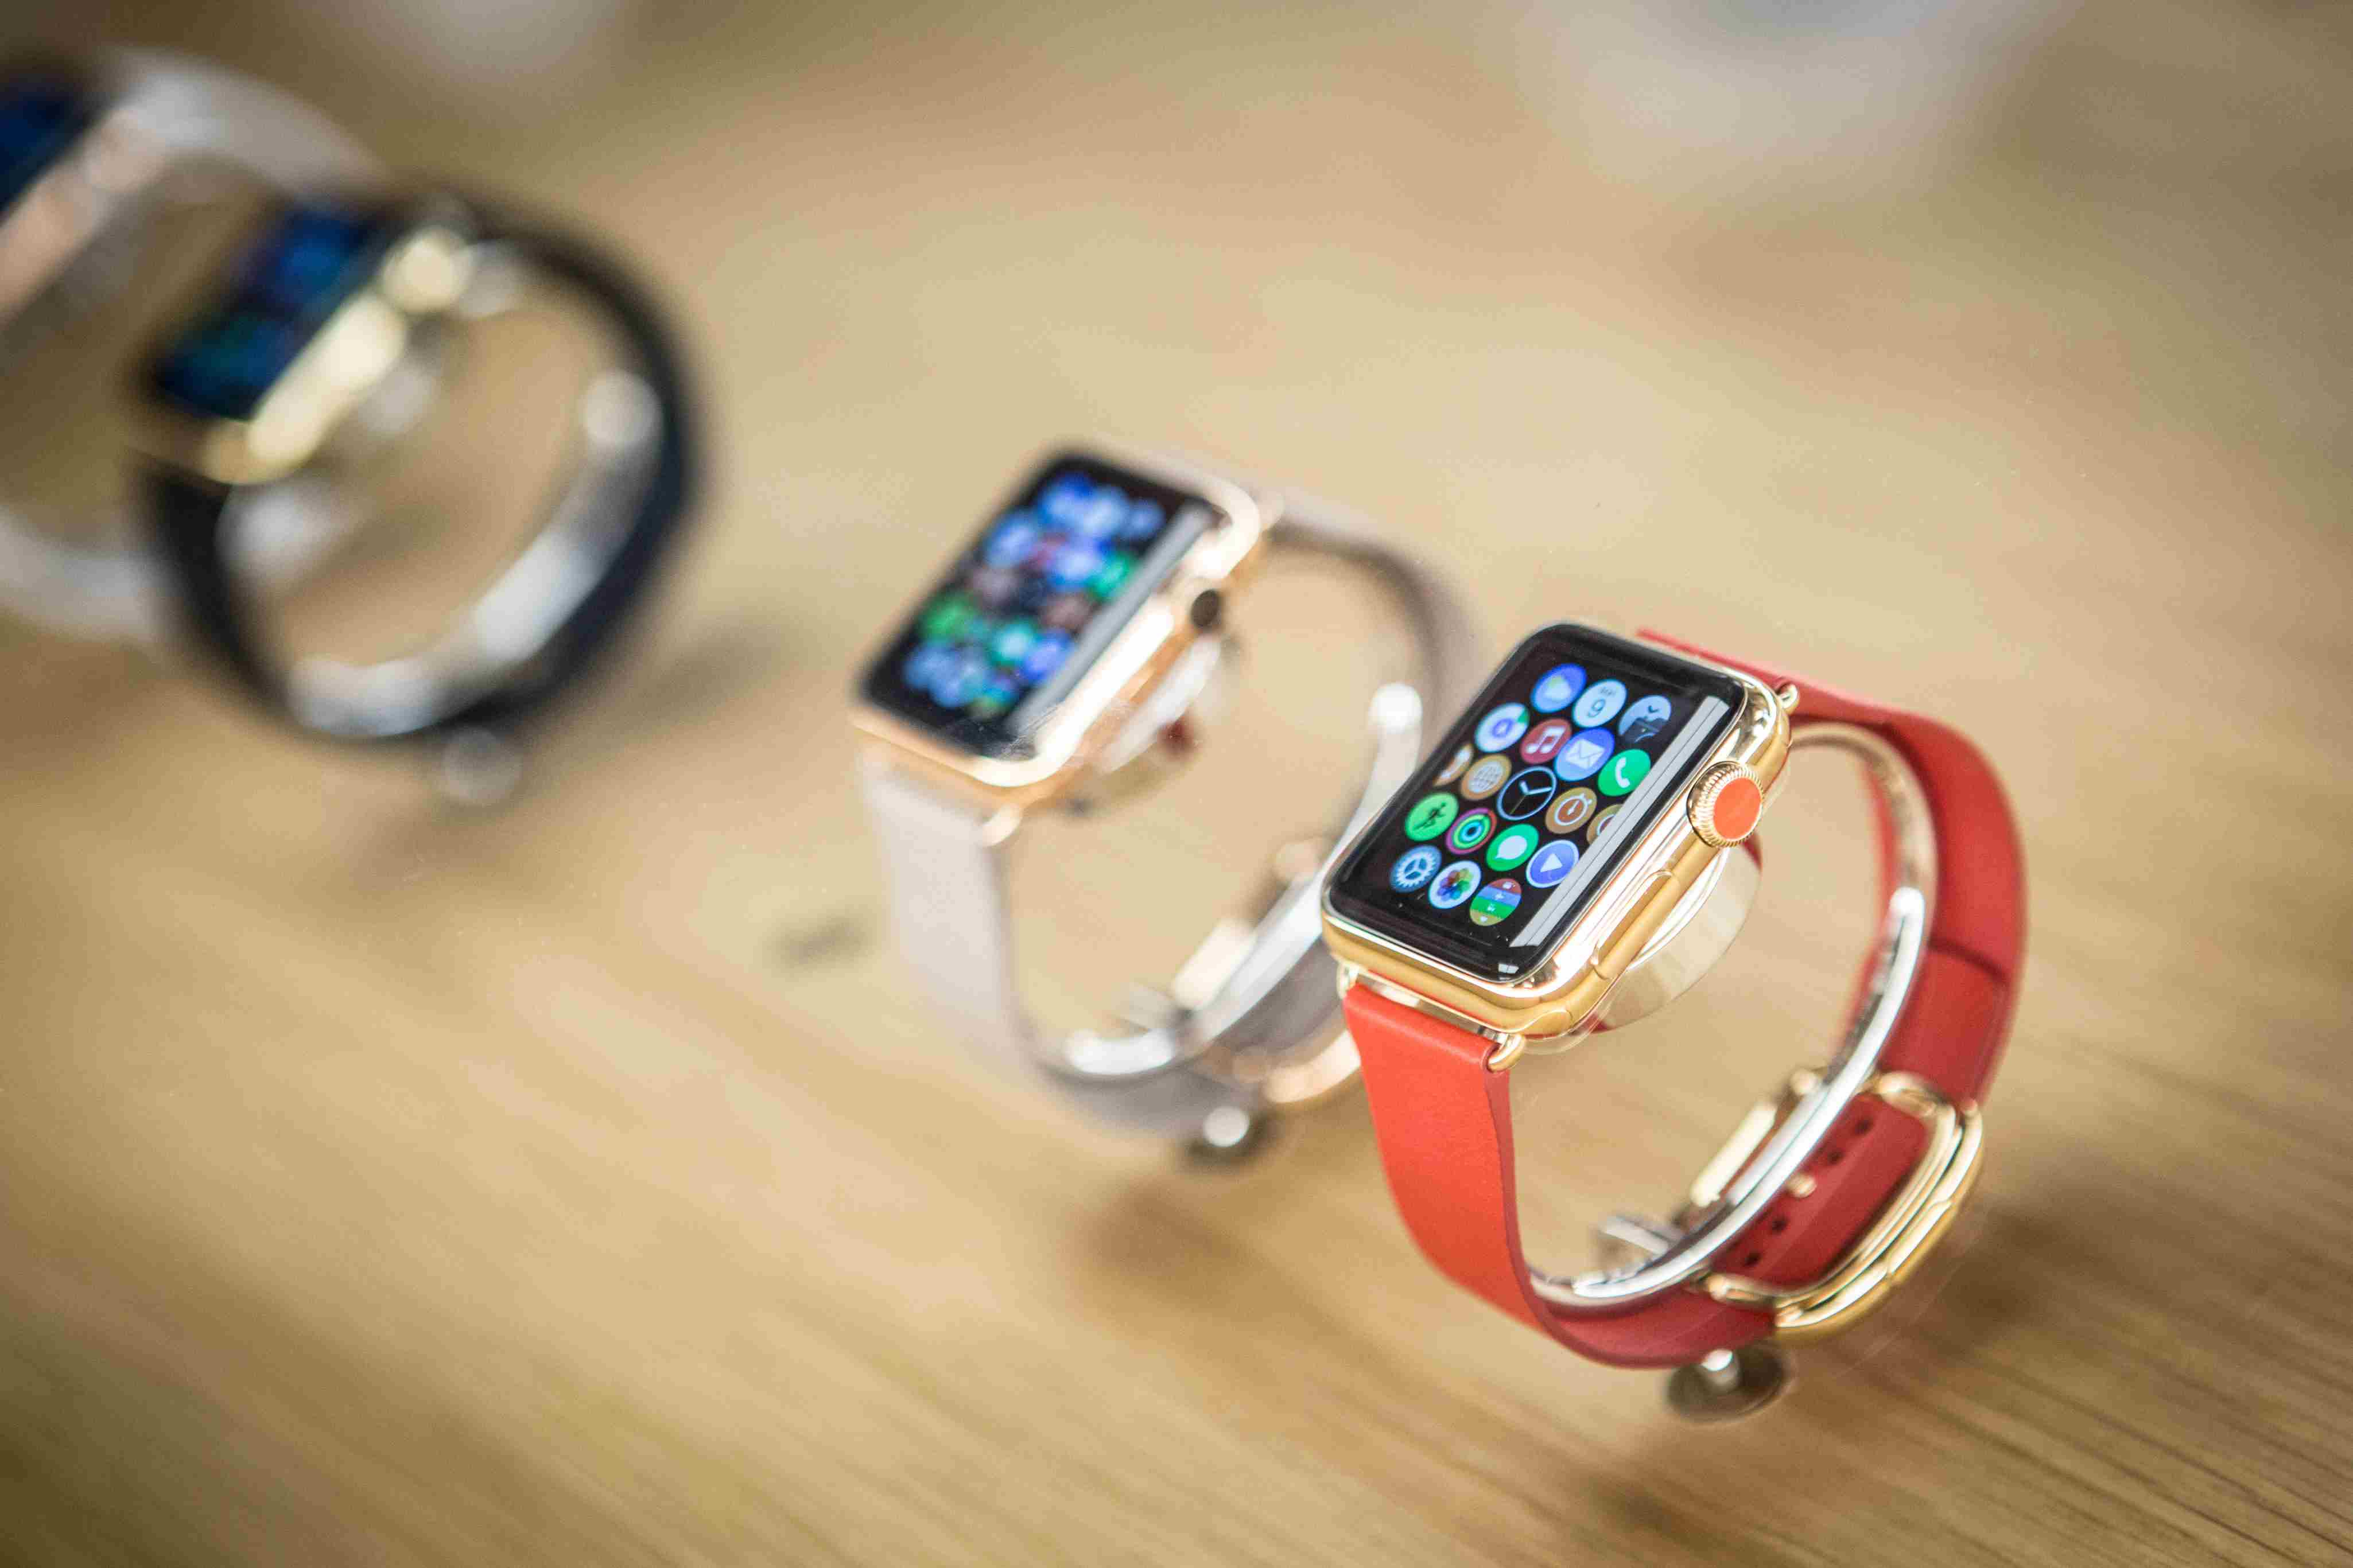 1st Anniversary Gifts -- Smart Watch / Apple Watch